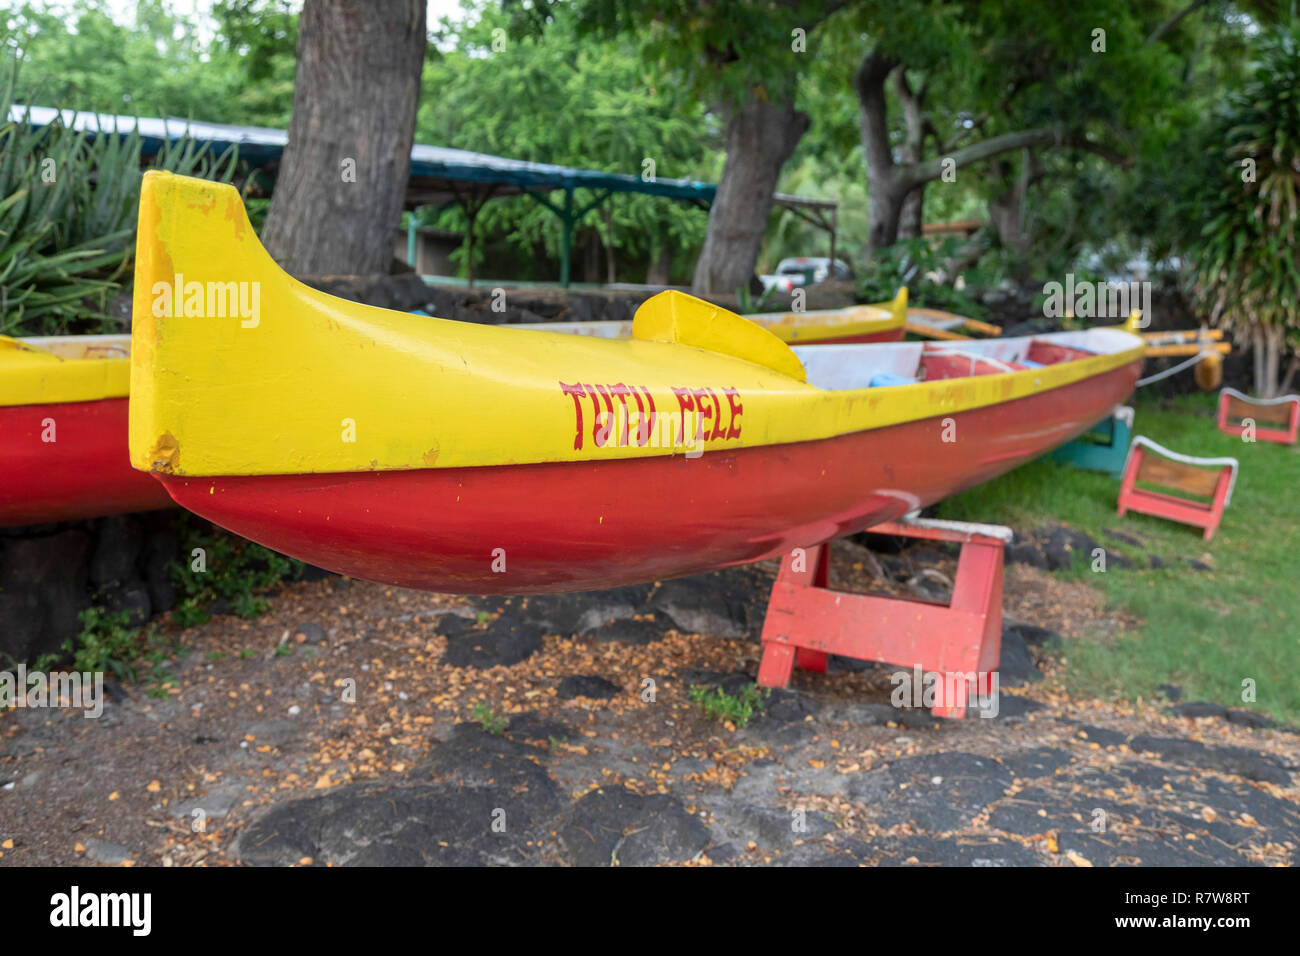 Honaunau, Hawaii - Ocean going canoes belonging to members of the Keoua Honaunau Canoe Club on Hawaii's Big Island. - Stock Image